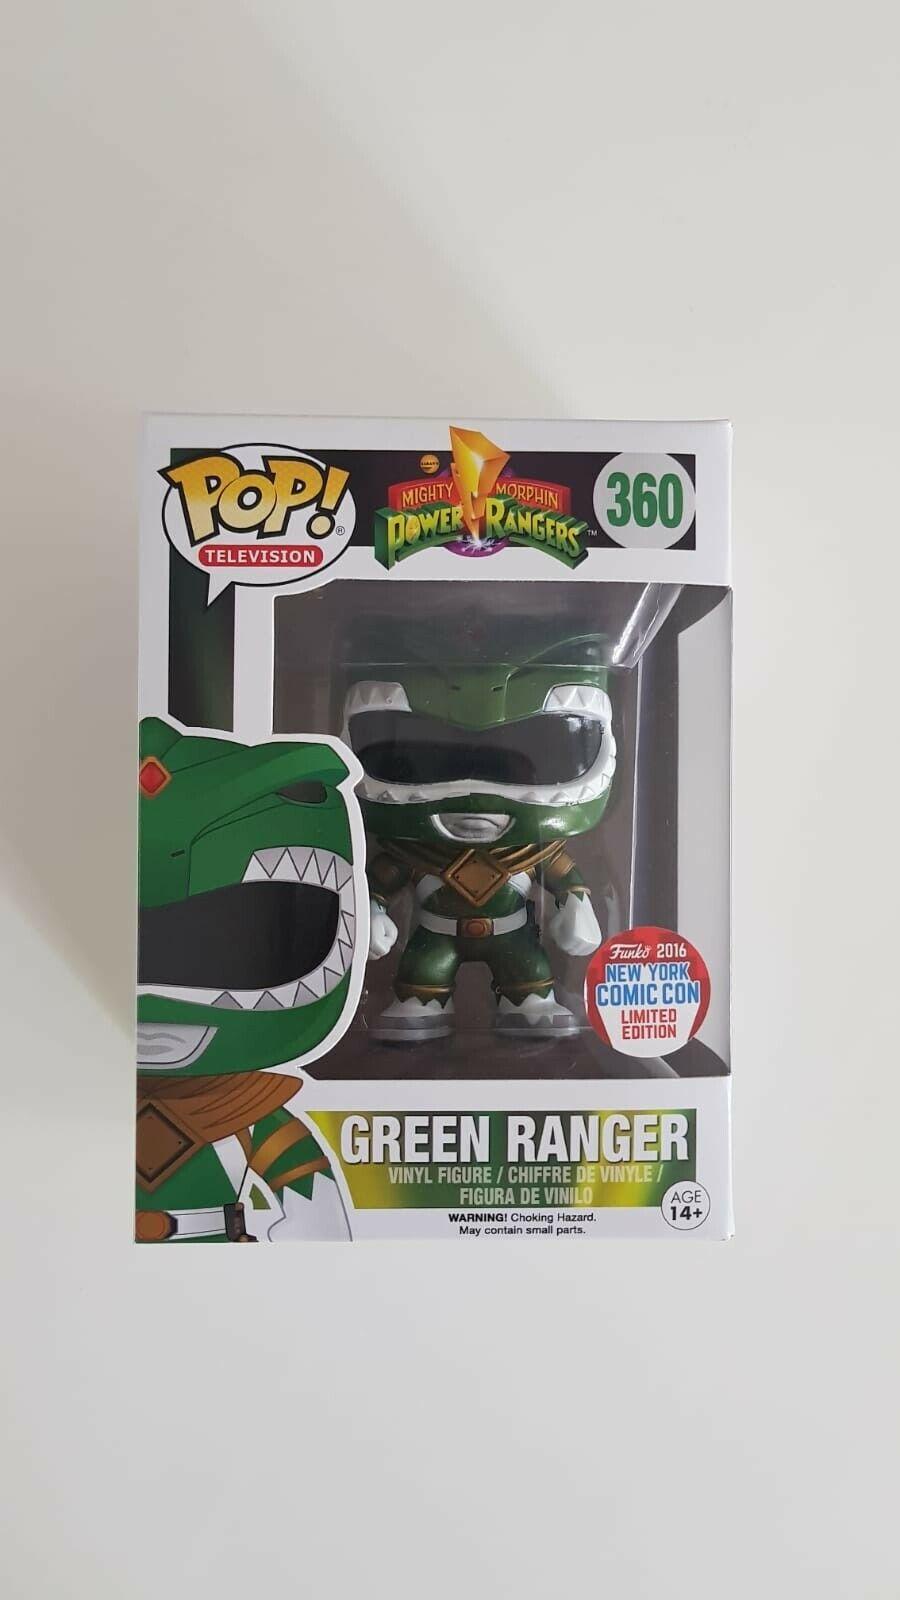 Power Rangers Green Ranger 360 (Metallic NYCC 2016) Funko Pop Vinyl